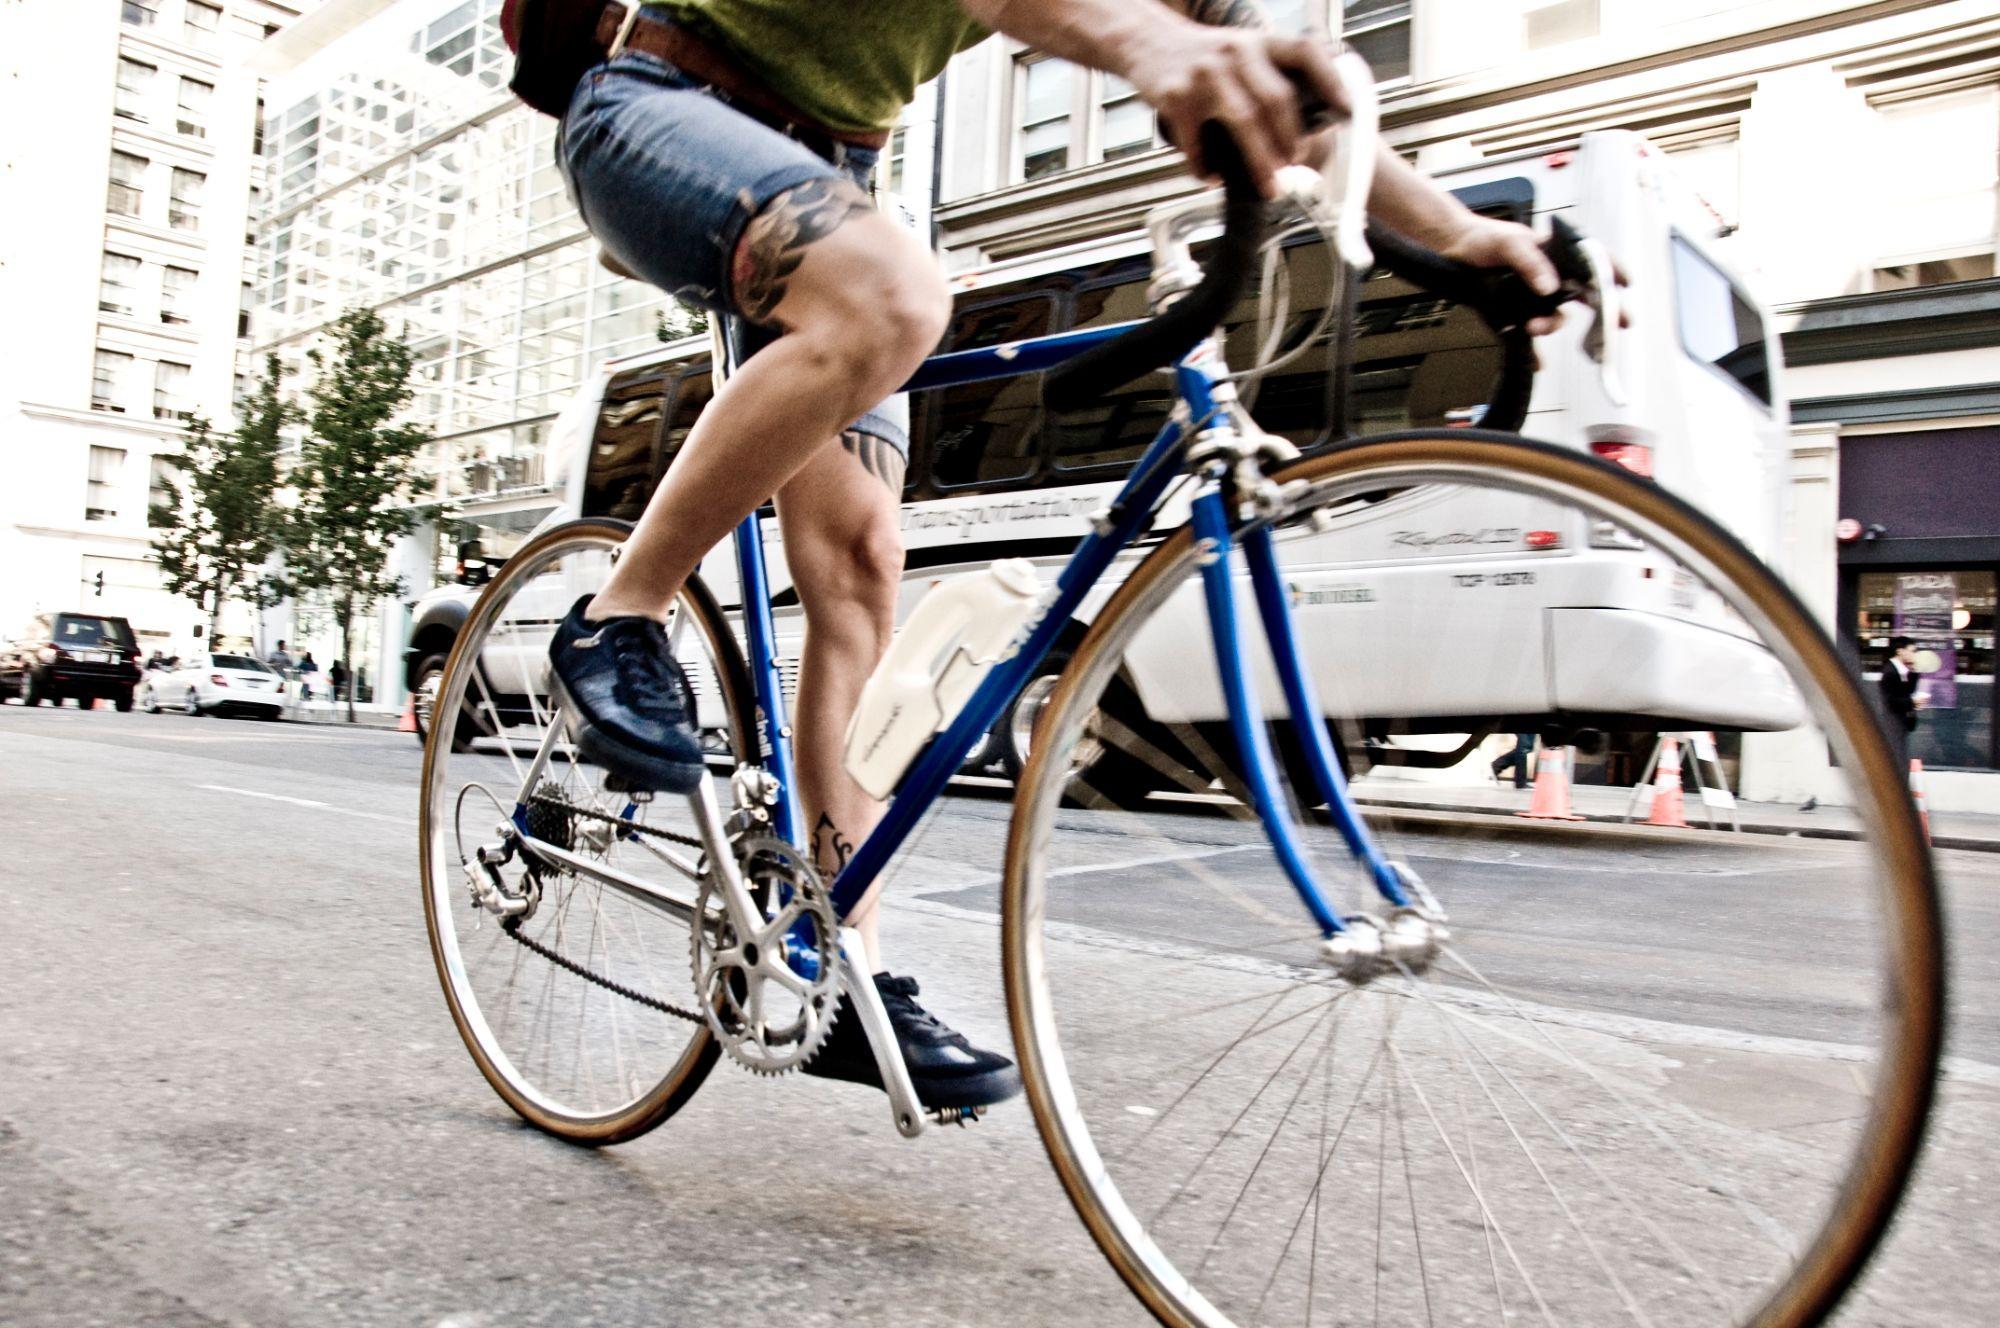 Ciclisti urbani